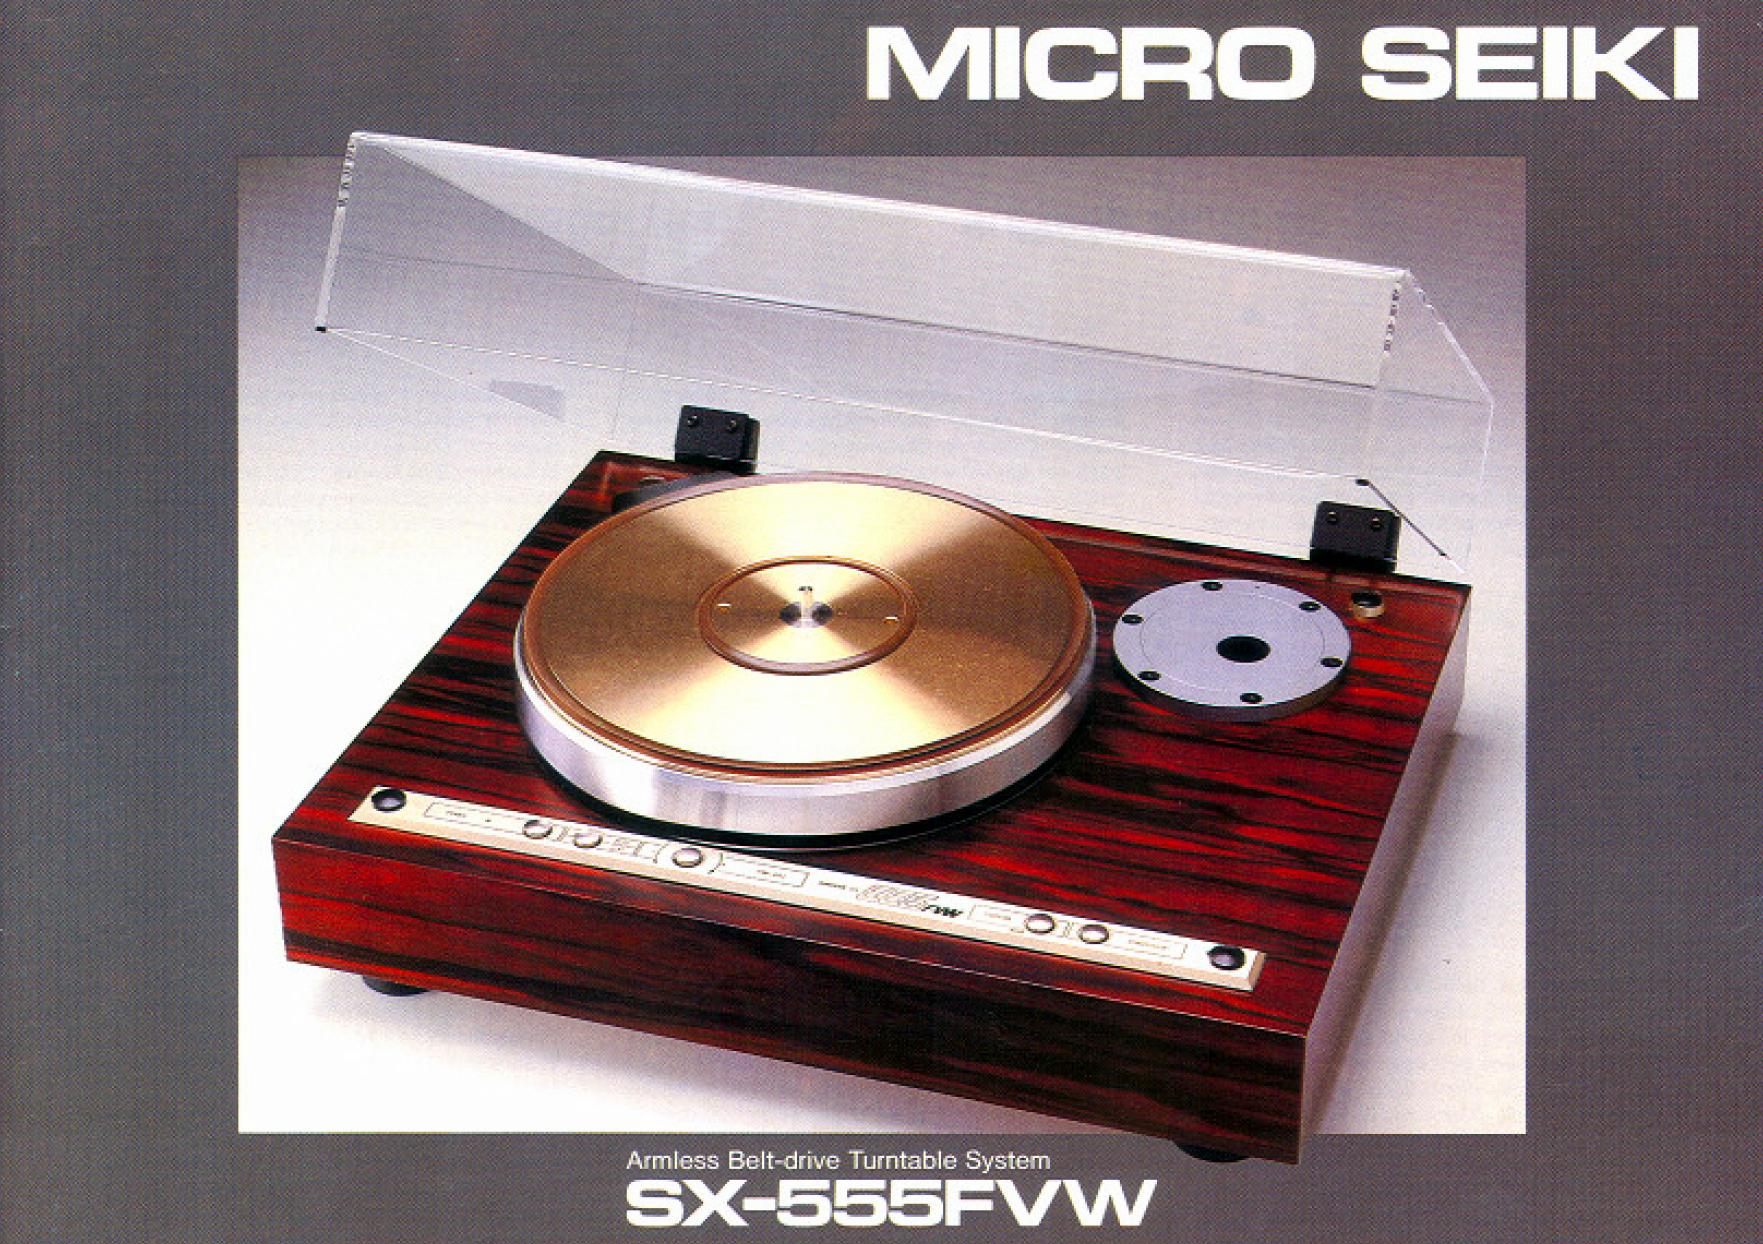 GUERRA CIVIL JAPONESA DEL AUDIO (70,s 80,s) - Página 24 Micro_Seiki_SX-555_FVW-Prospekt-1